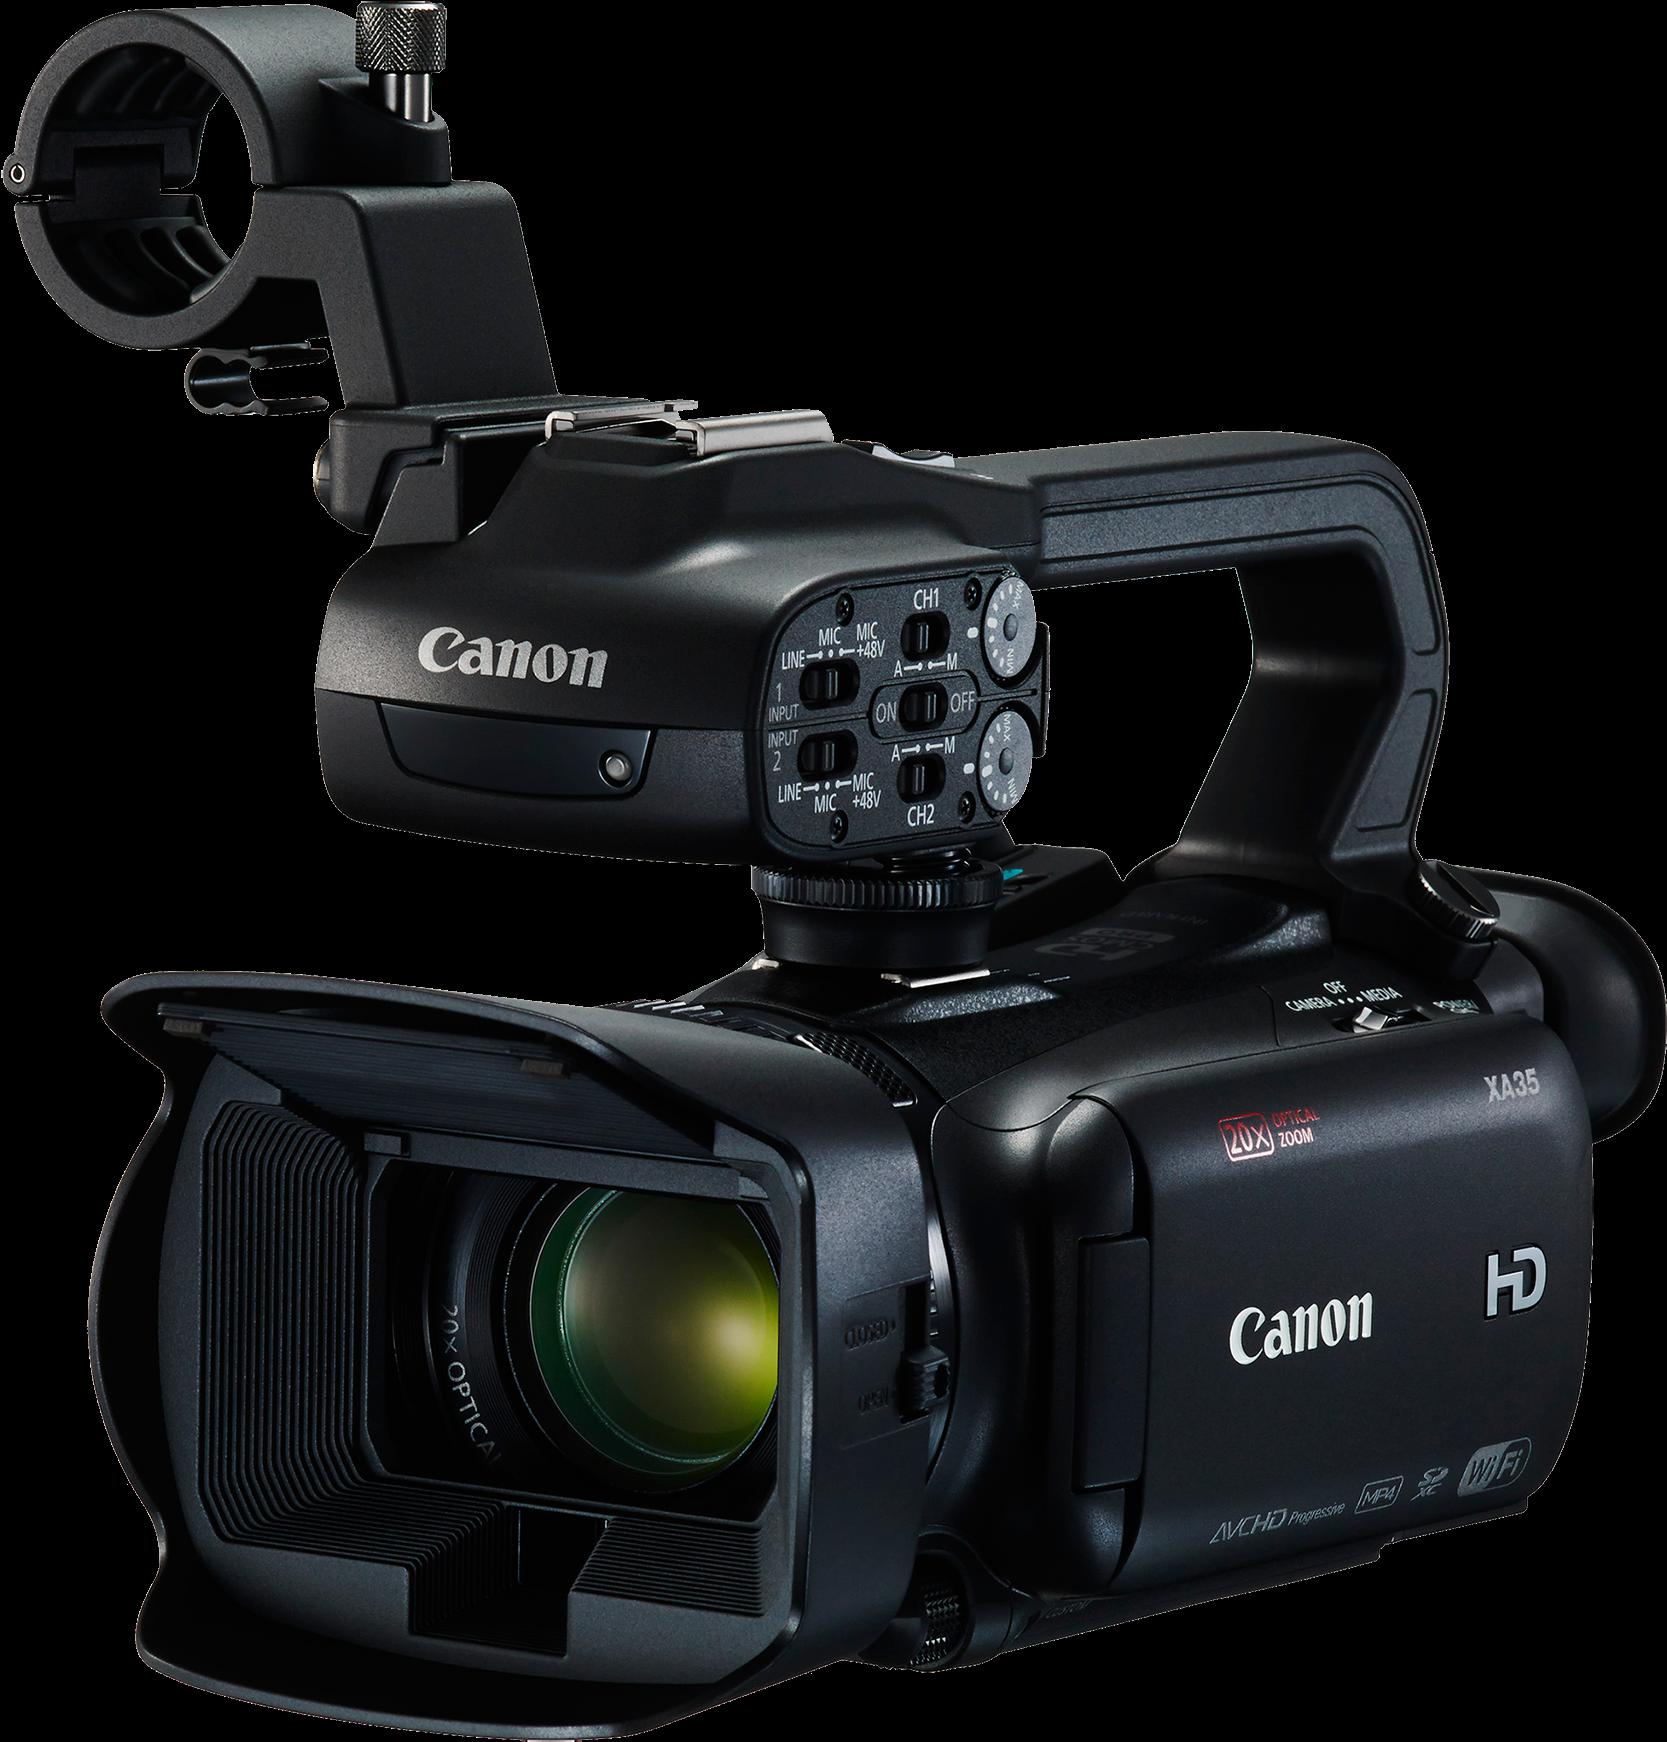 Камера видео онлайн жопы прозрачных трусиках